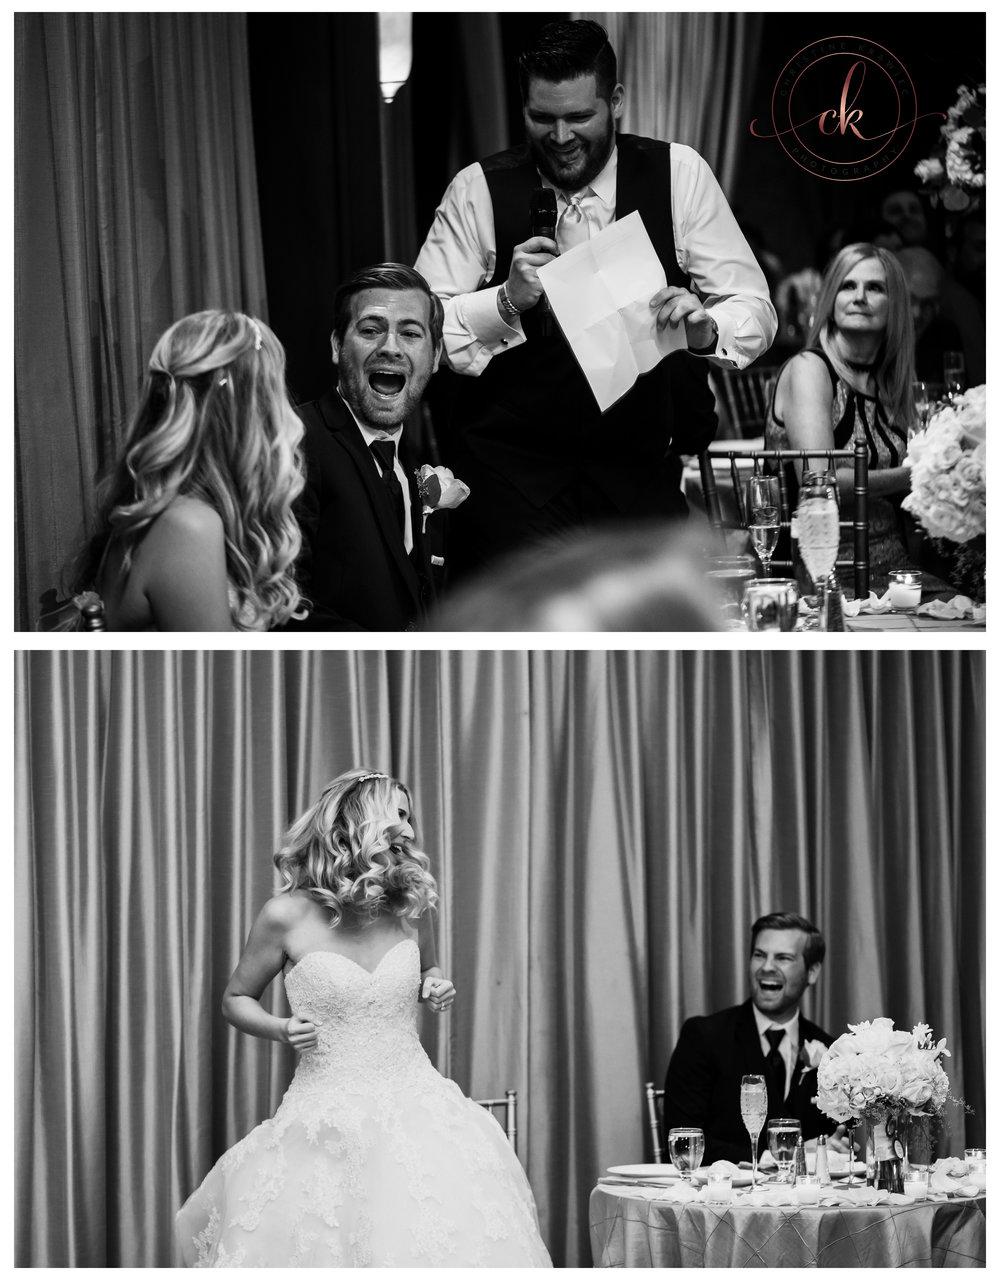 48 running_man_wedding_speech.jpg